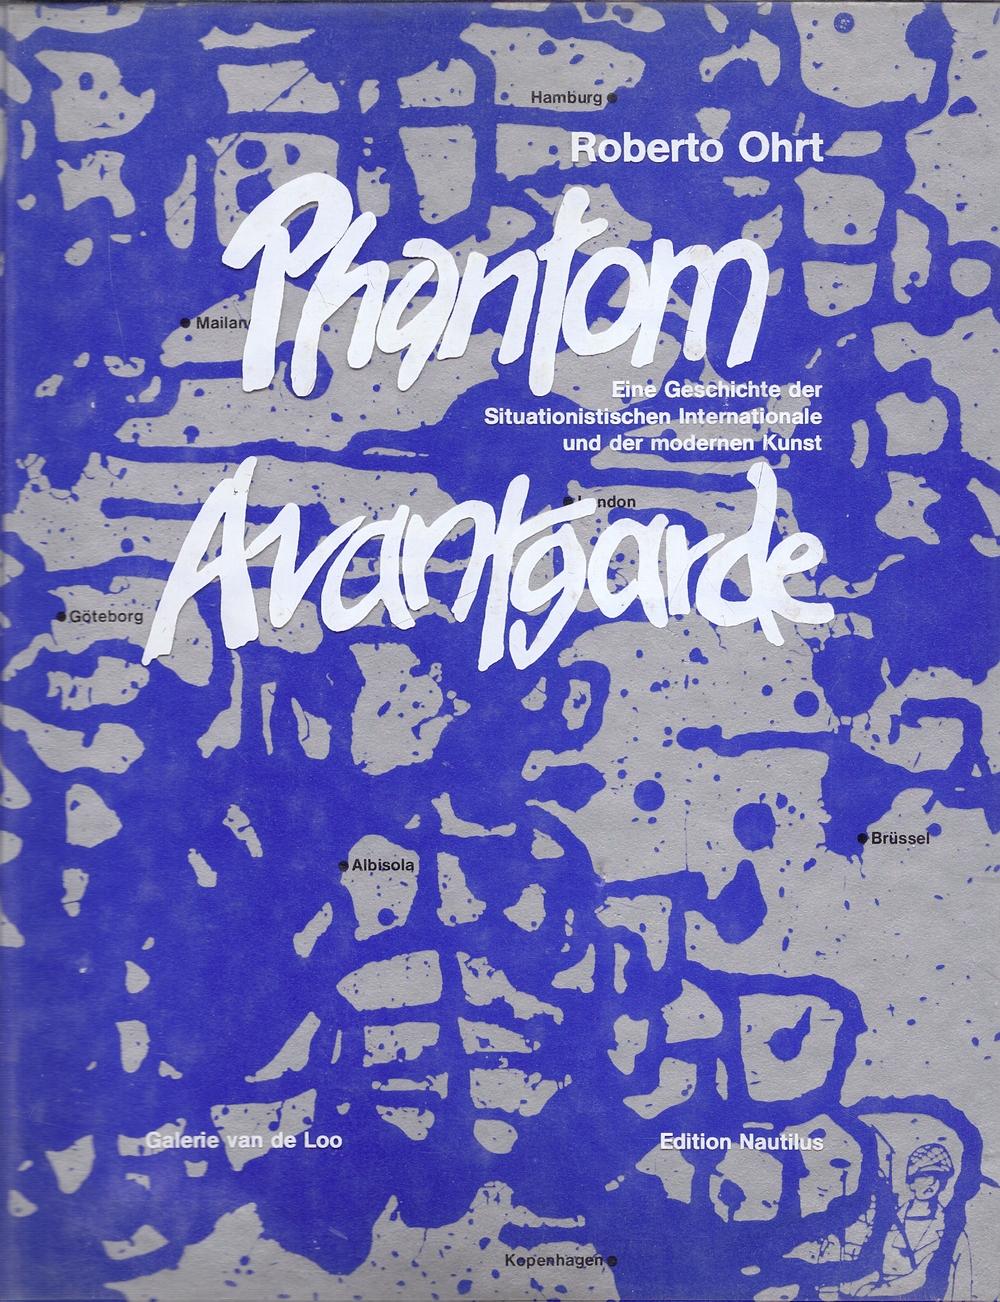 Robert Ort,Phantom Avantgarde, Galerie van de Loo, 1990